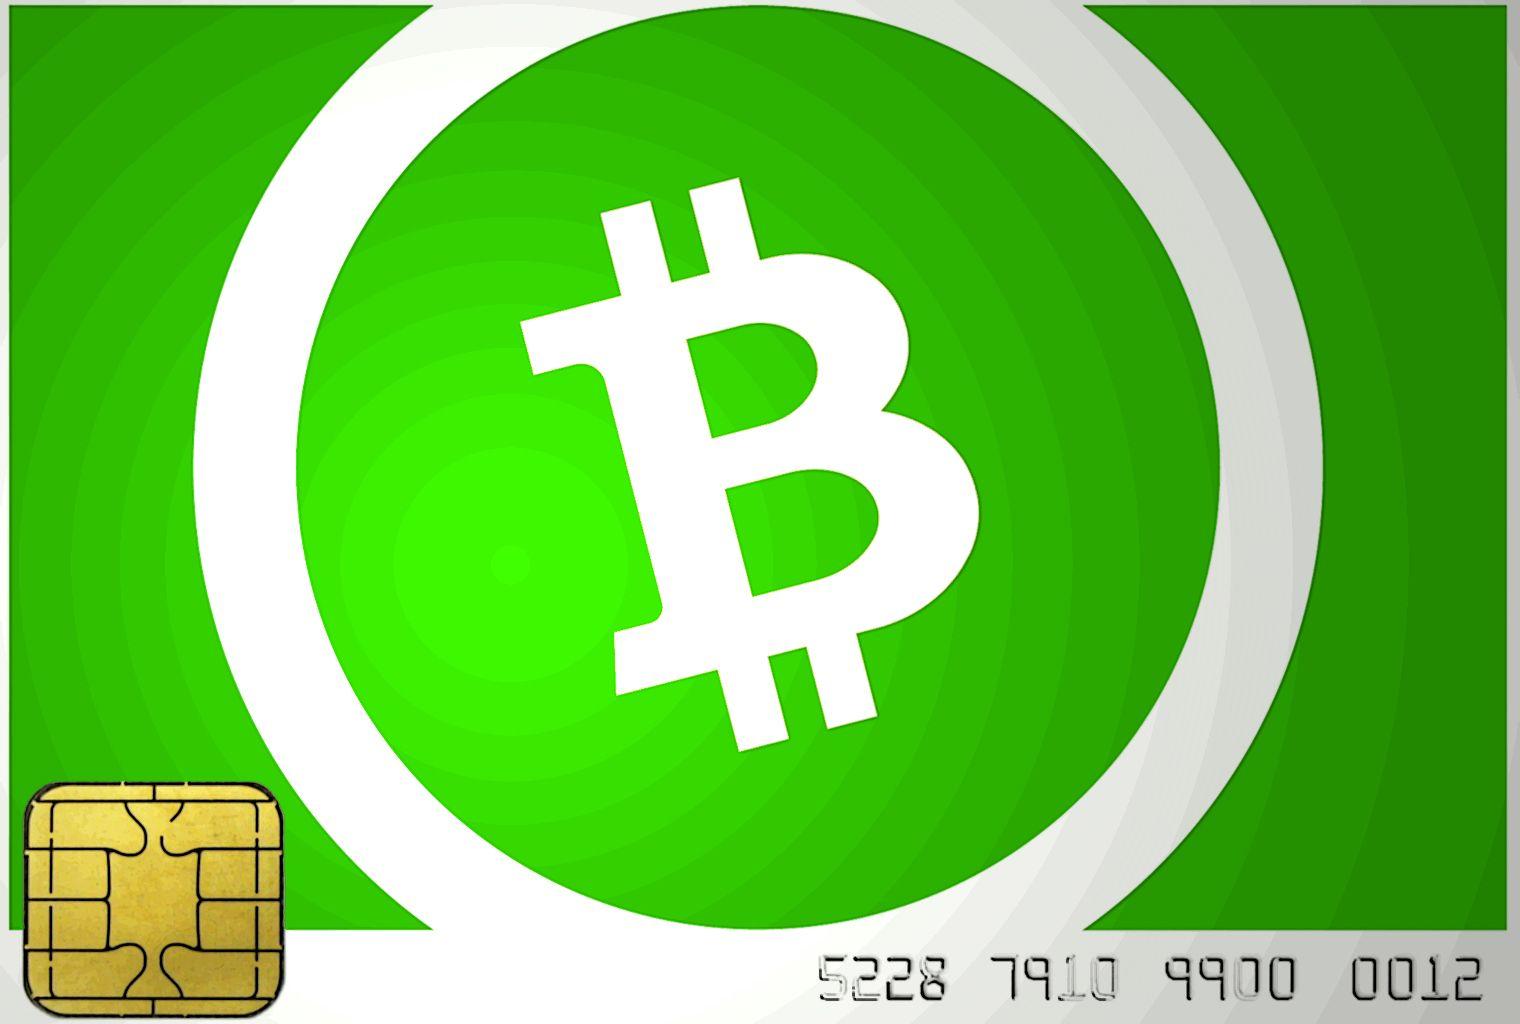 sistemul crypto vip bitcoin în această dimineață holly